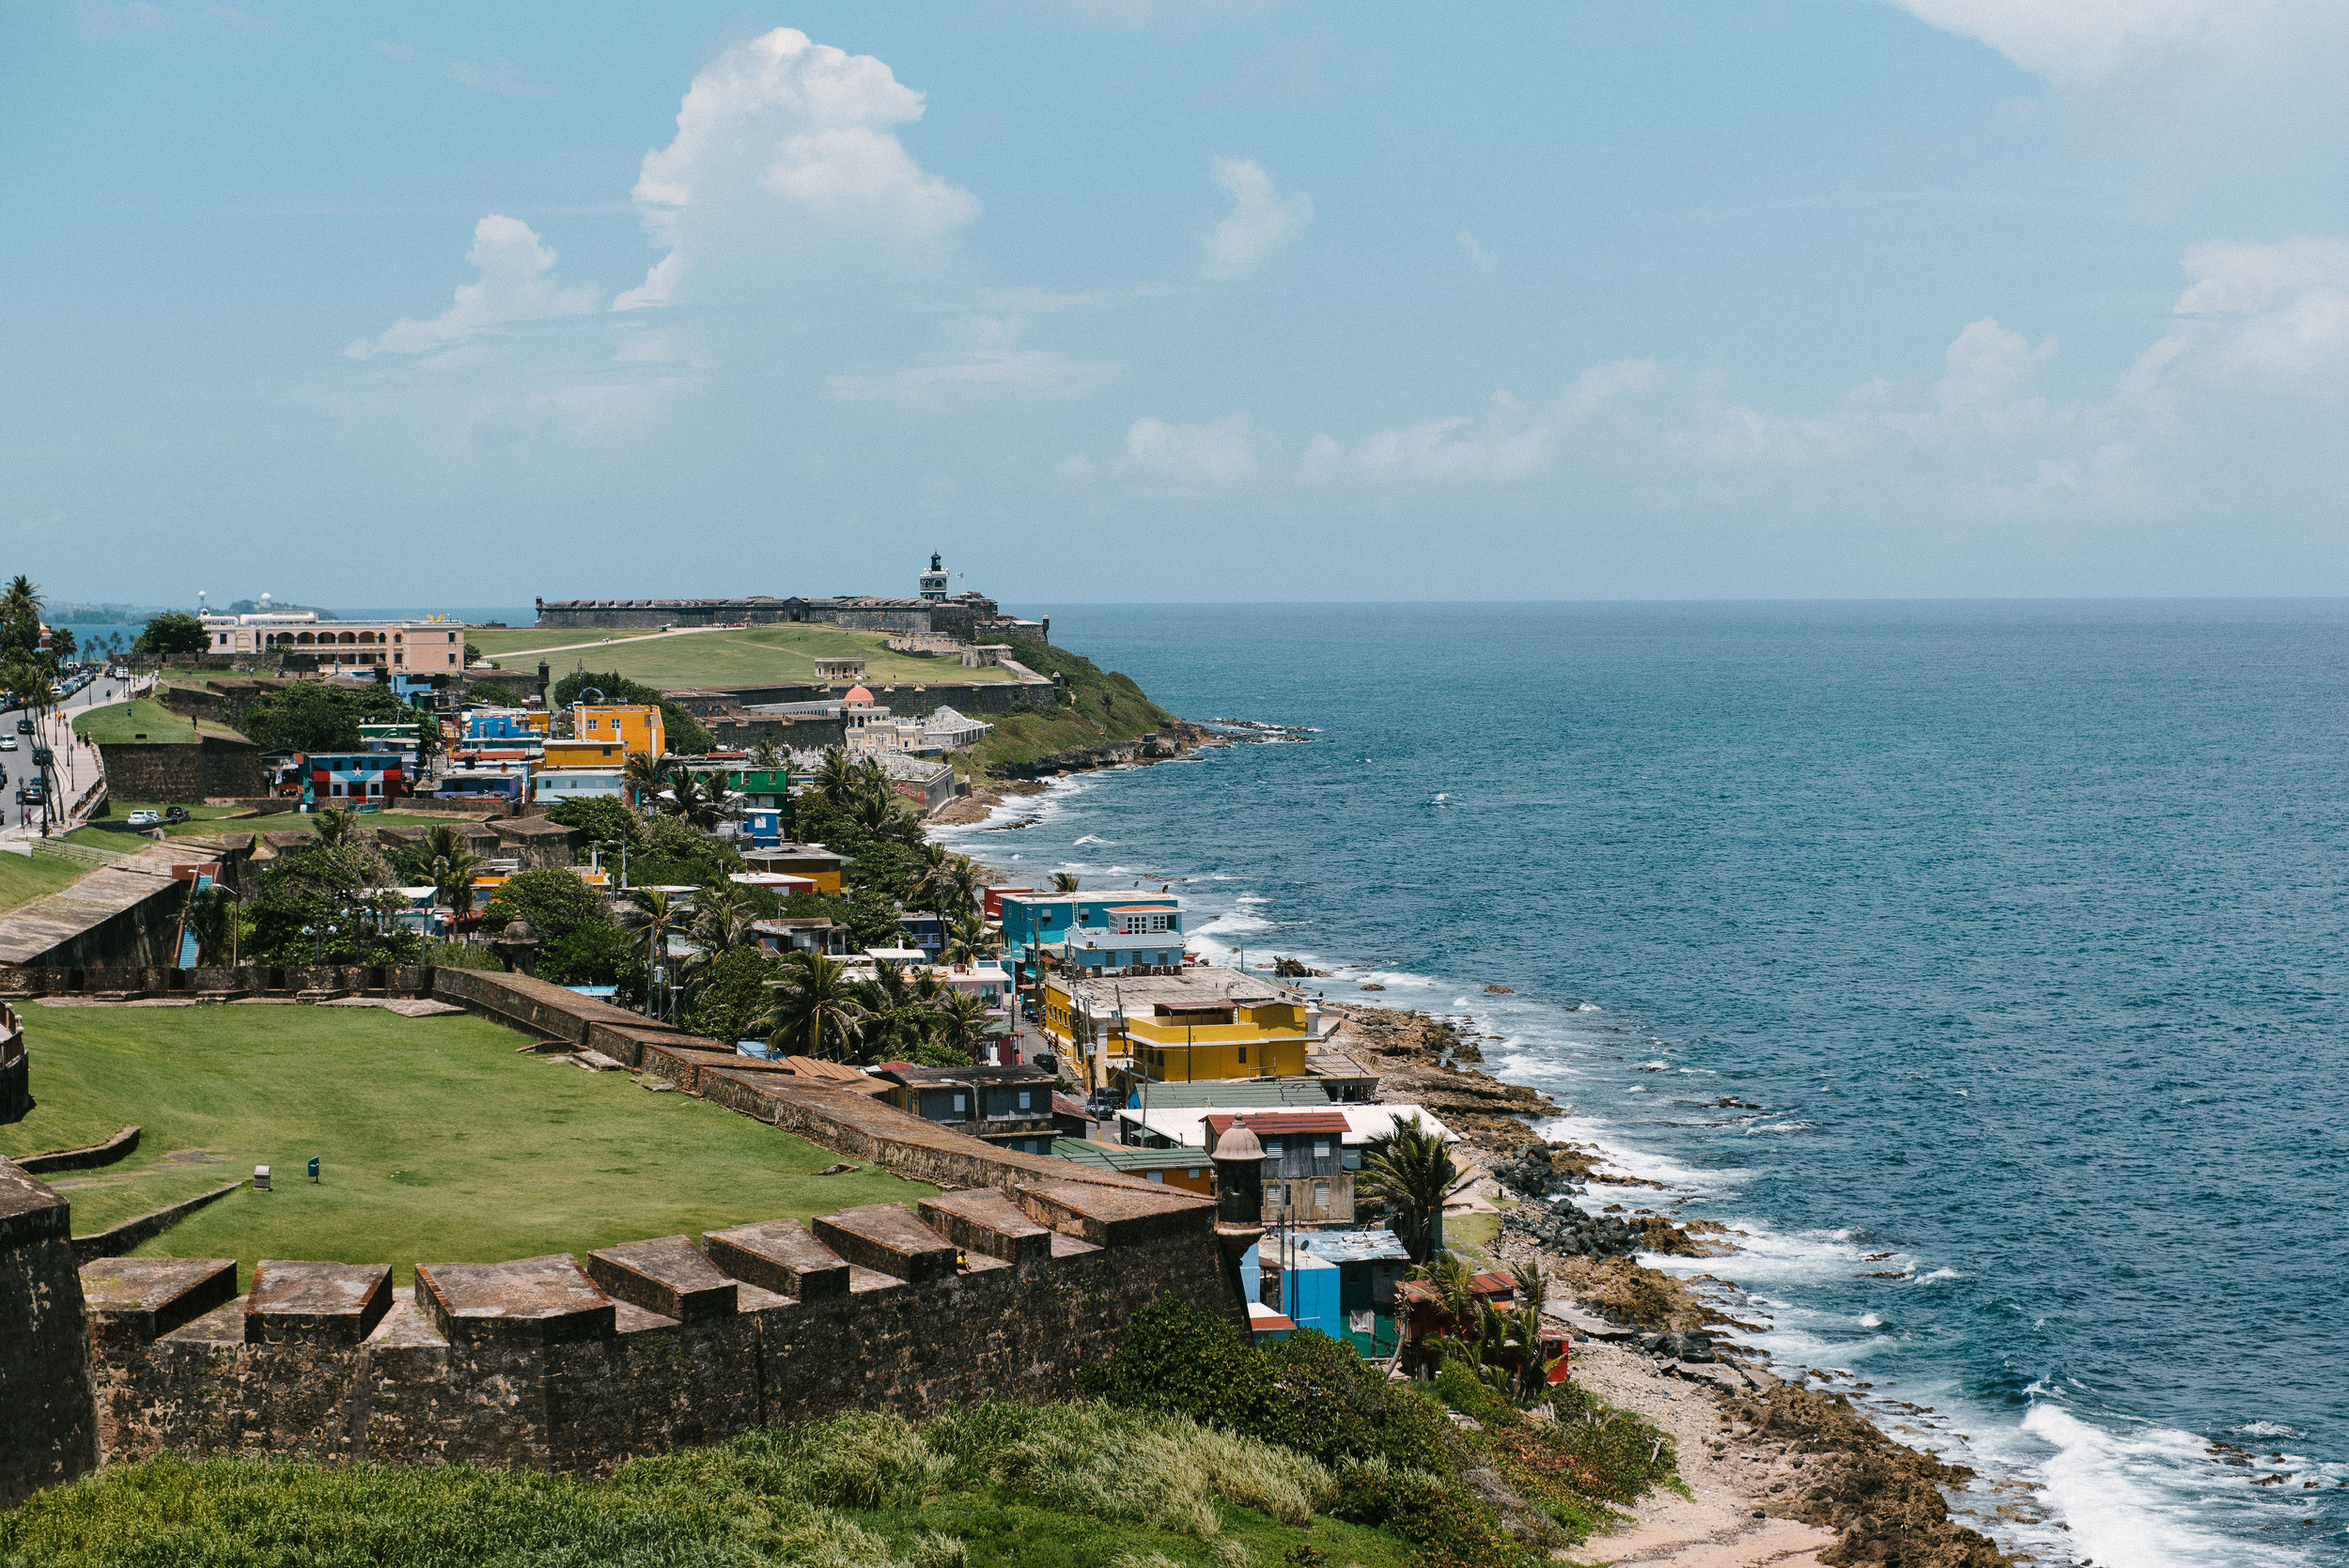 View of Old San Juan, Puerto Rico